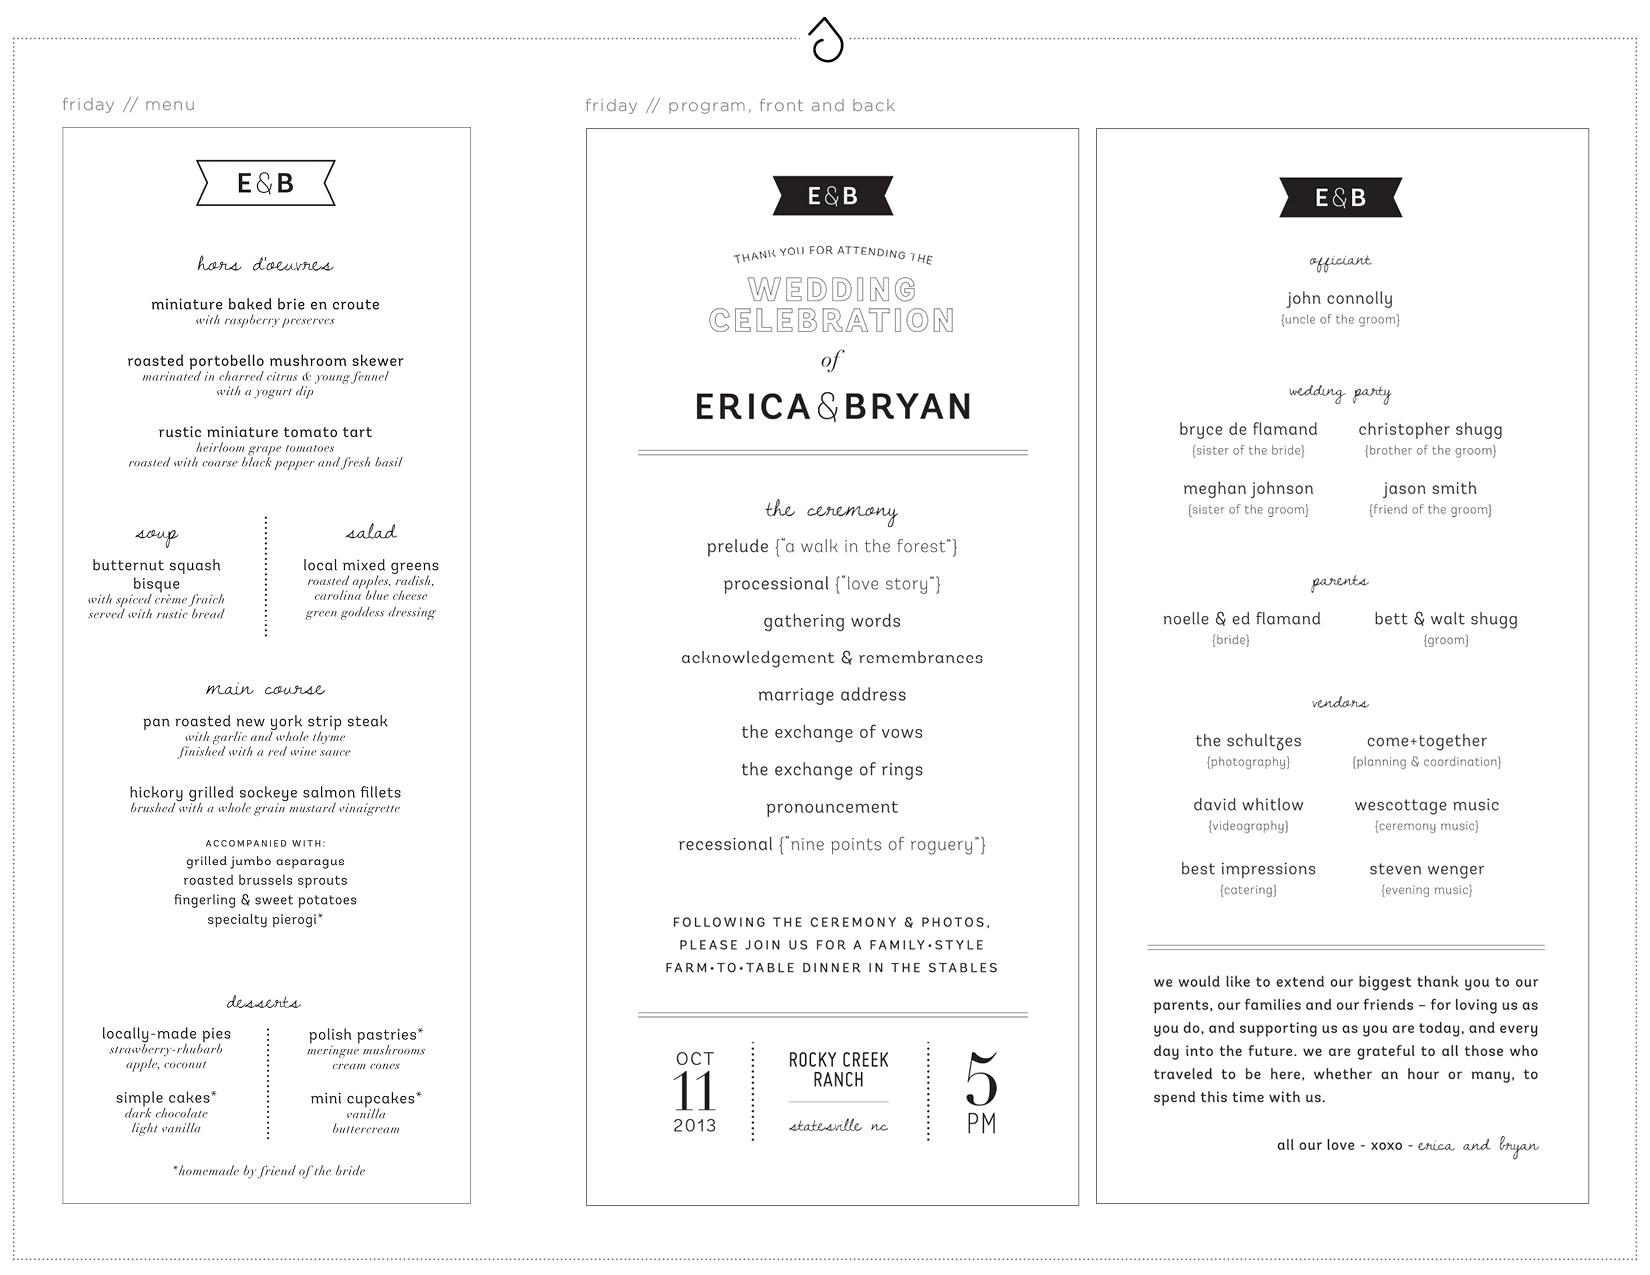 Friday Dinner Menu and Friday Ceremony Program - Erica & Bryan 10.11+12.13